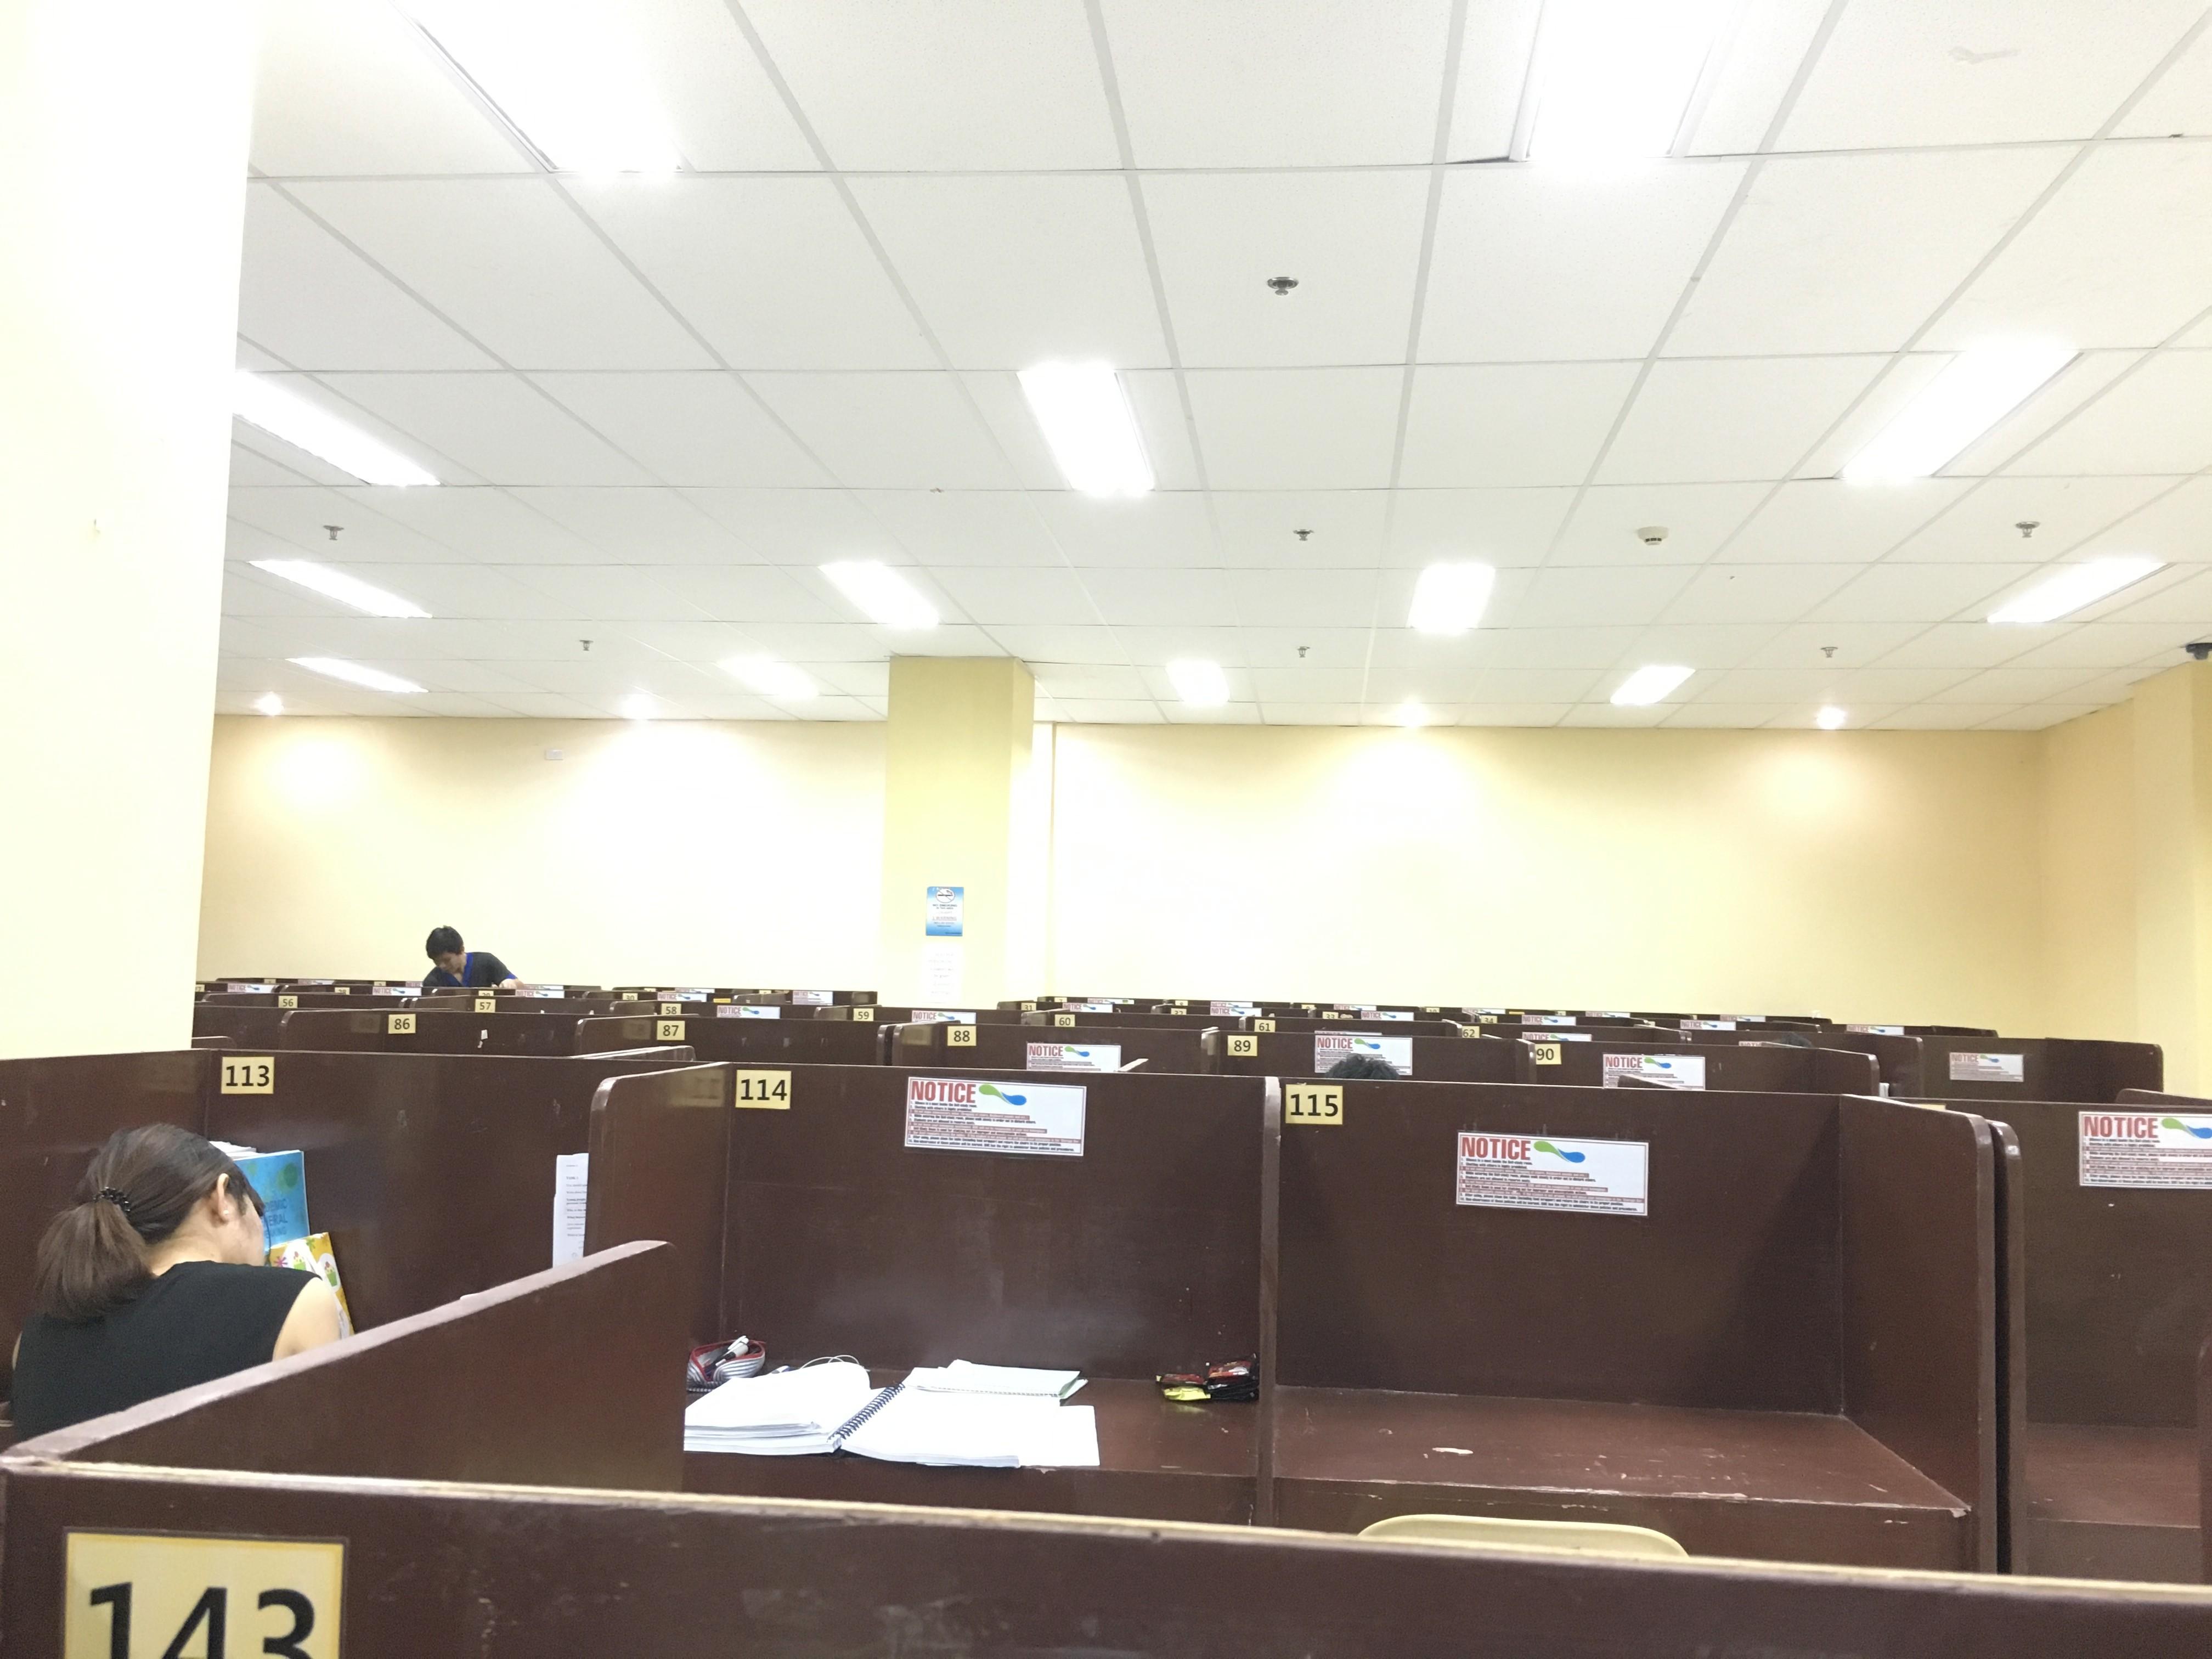 selfstudyroom